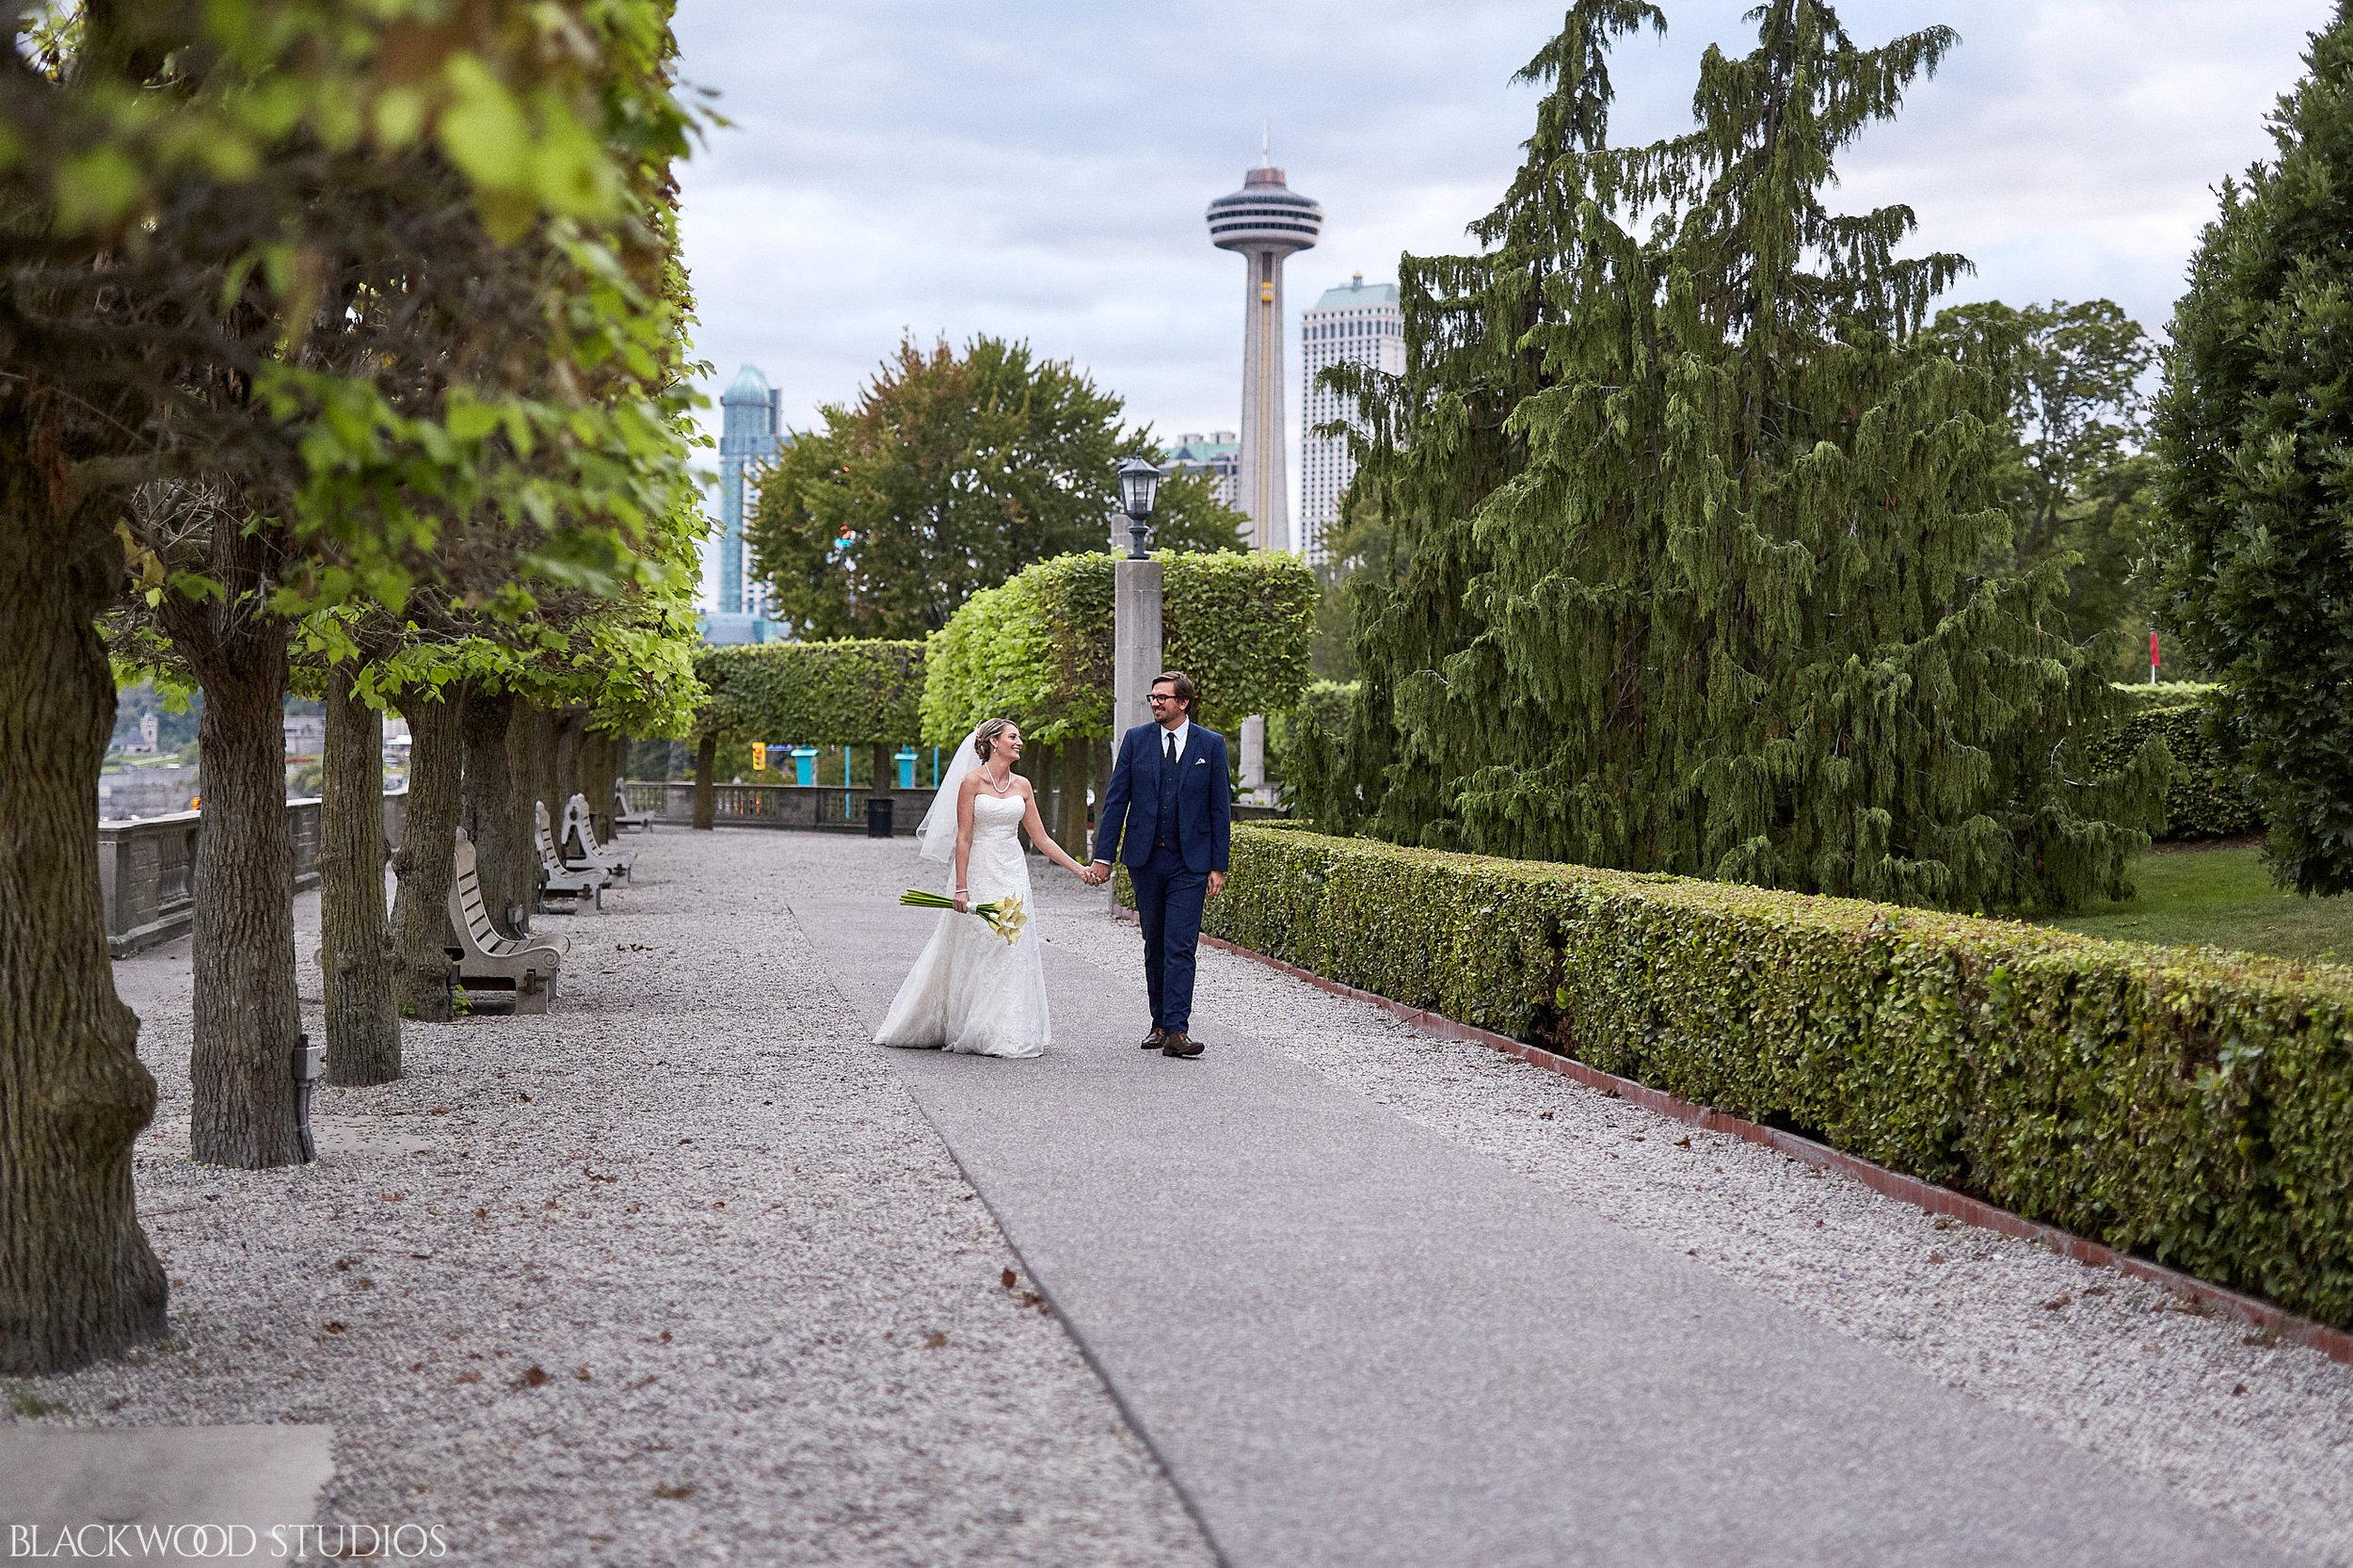 Blackwood-Studios-Wedding-Photography-20170928-183218-Marek-Katie-Michalek-Oakes-Garden-Theatre-Niagara-Falls-Ontario-Canada.jpg